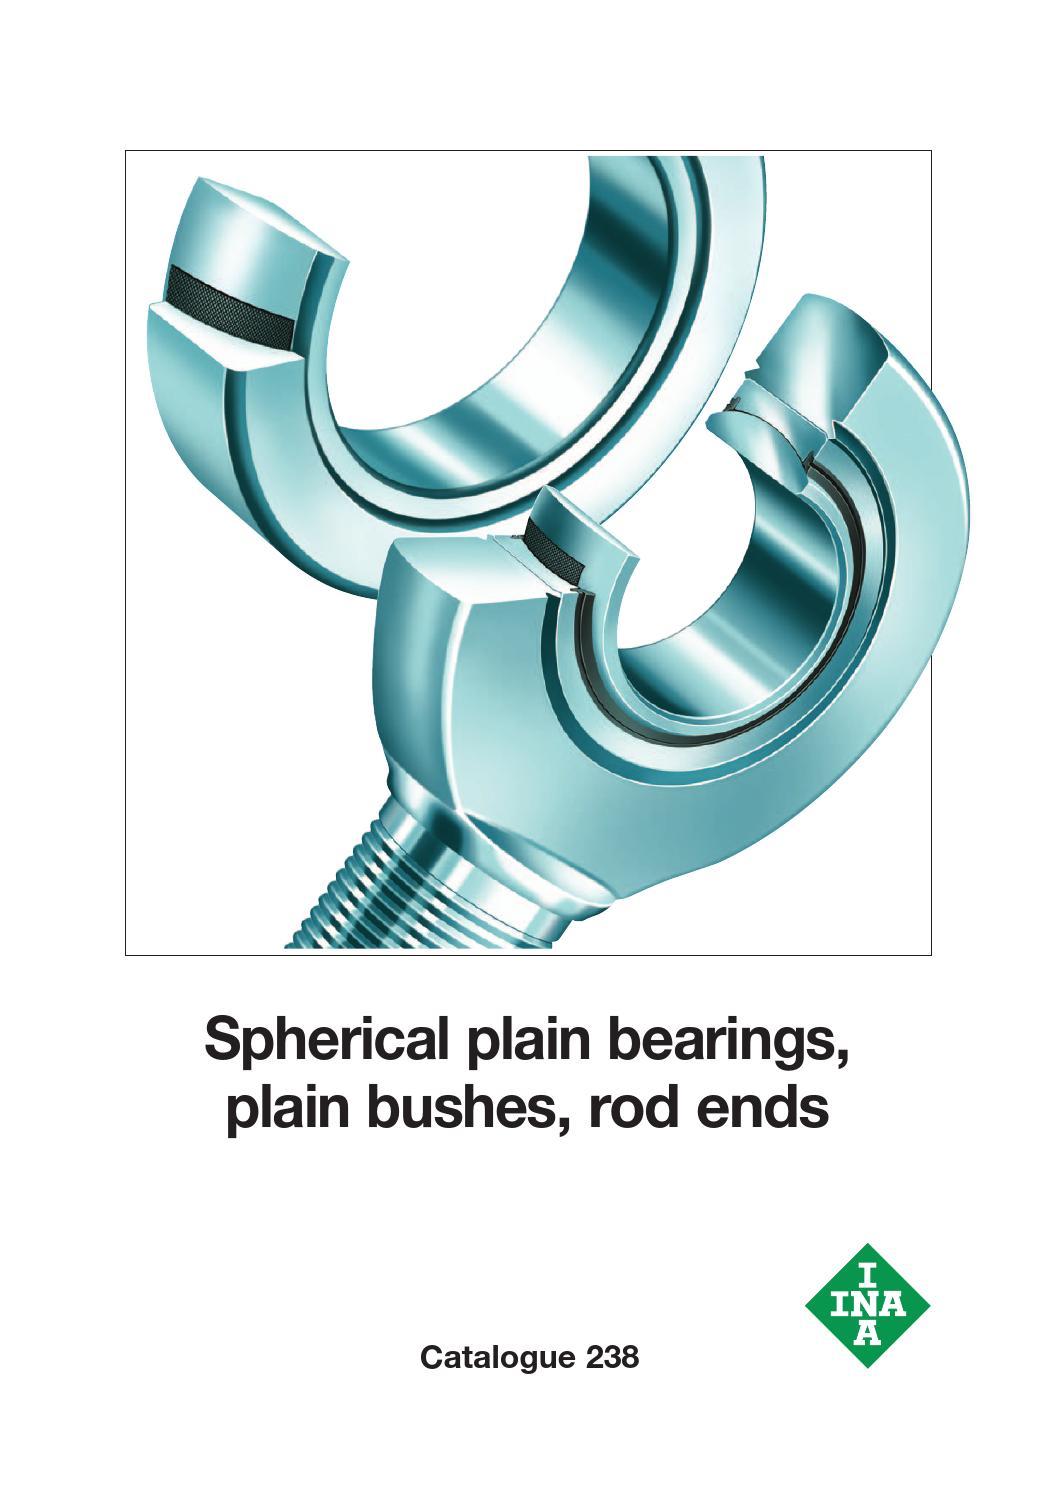 INA-GE35-UK-2RS INA Elges spherical plain bearing